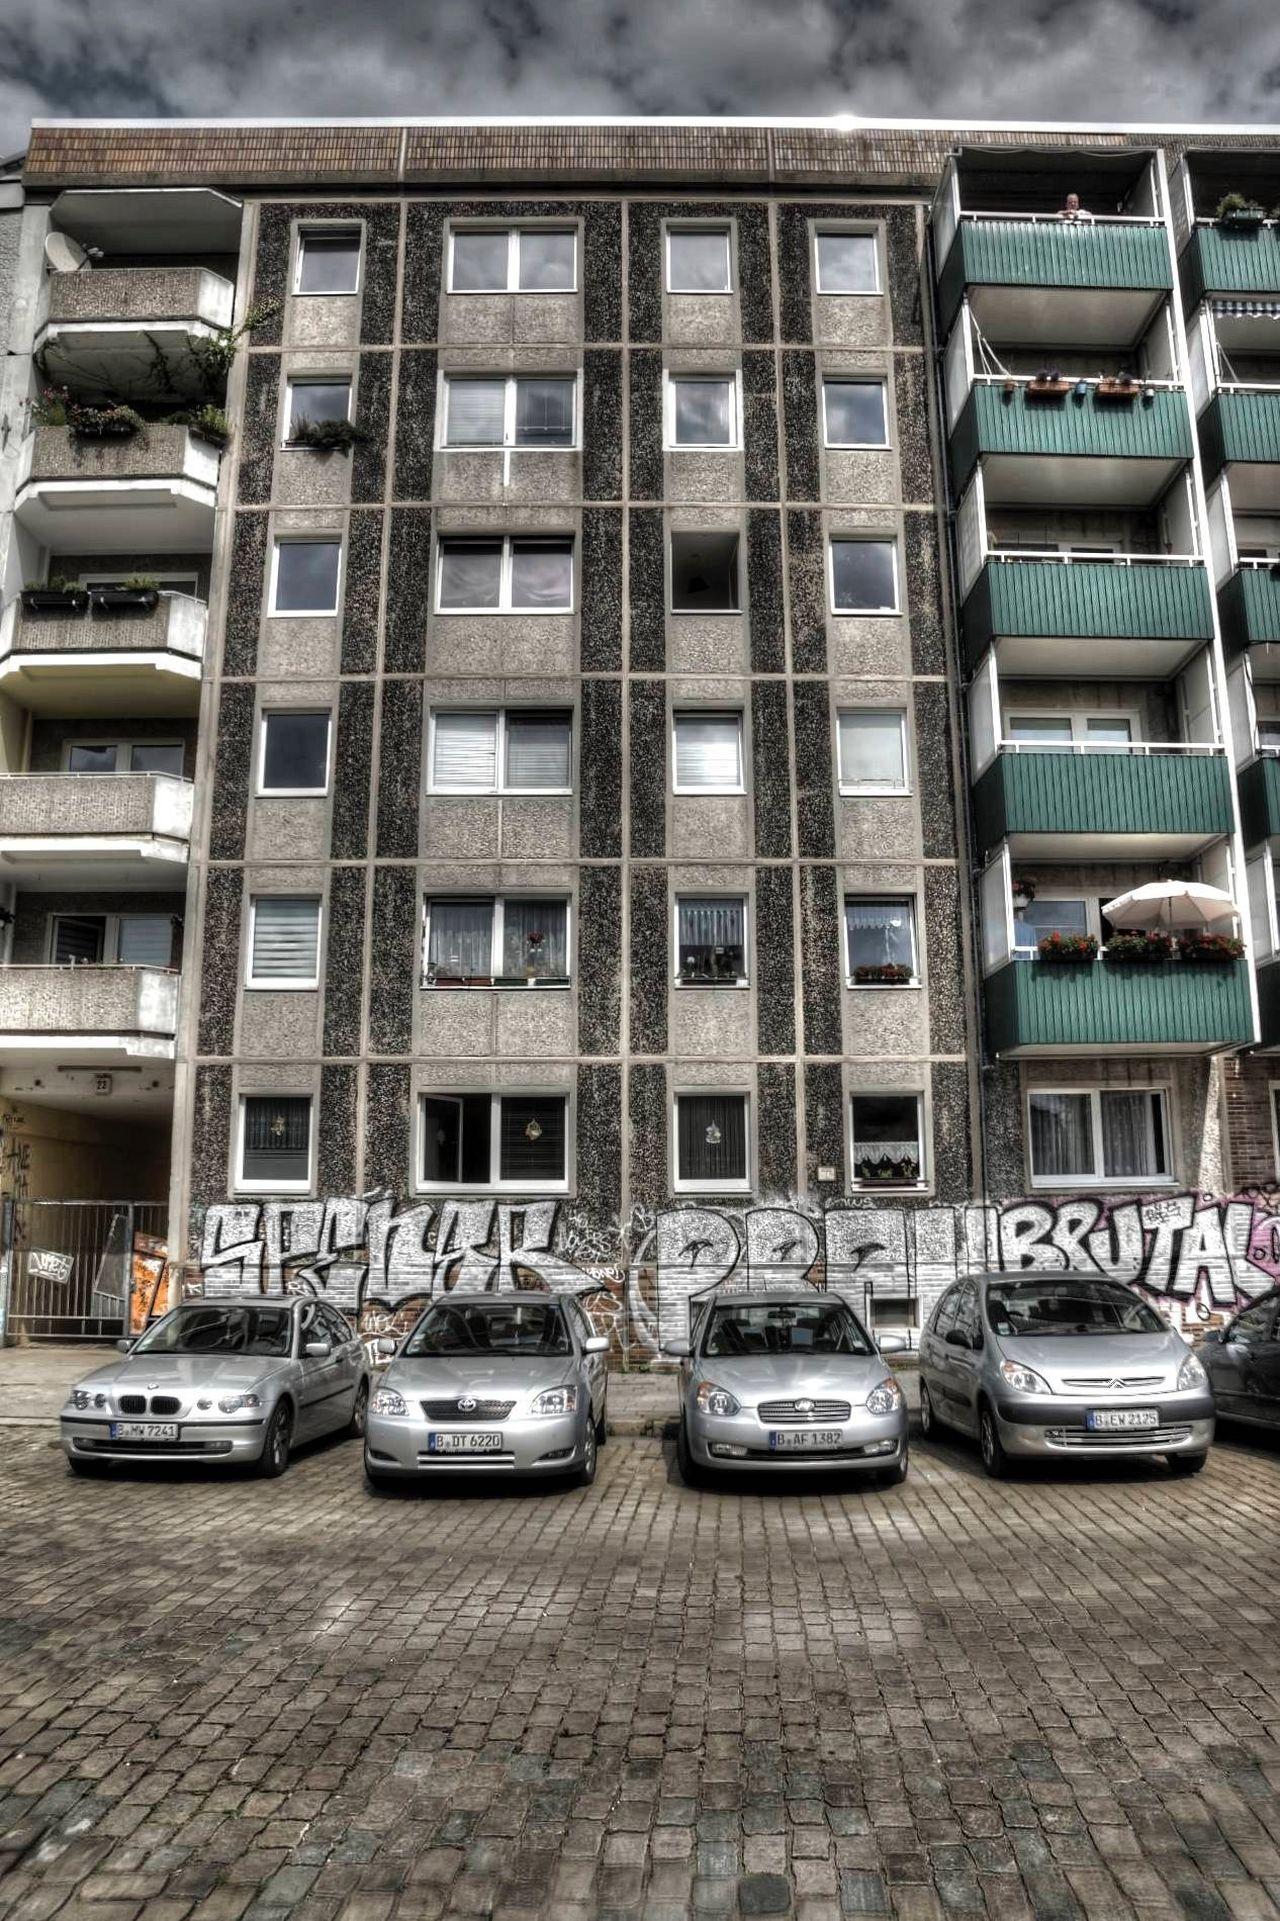 Architecture Berlin Building Exterior Built Structure Car Day No People Outdoors Plattenbau